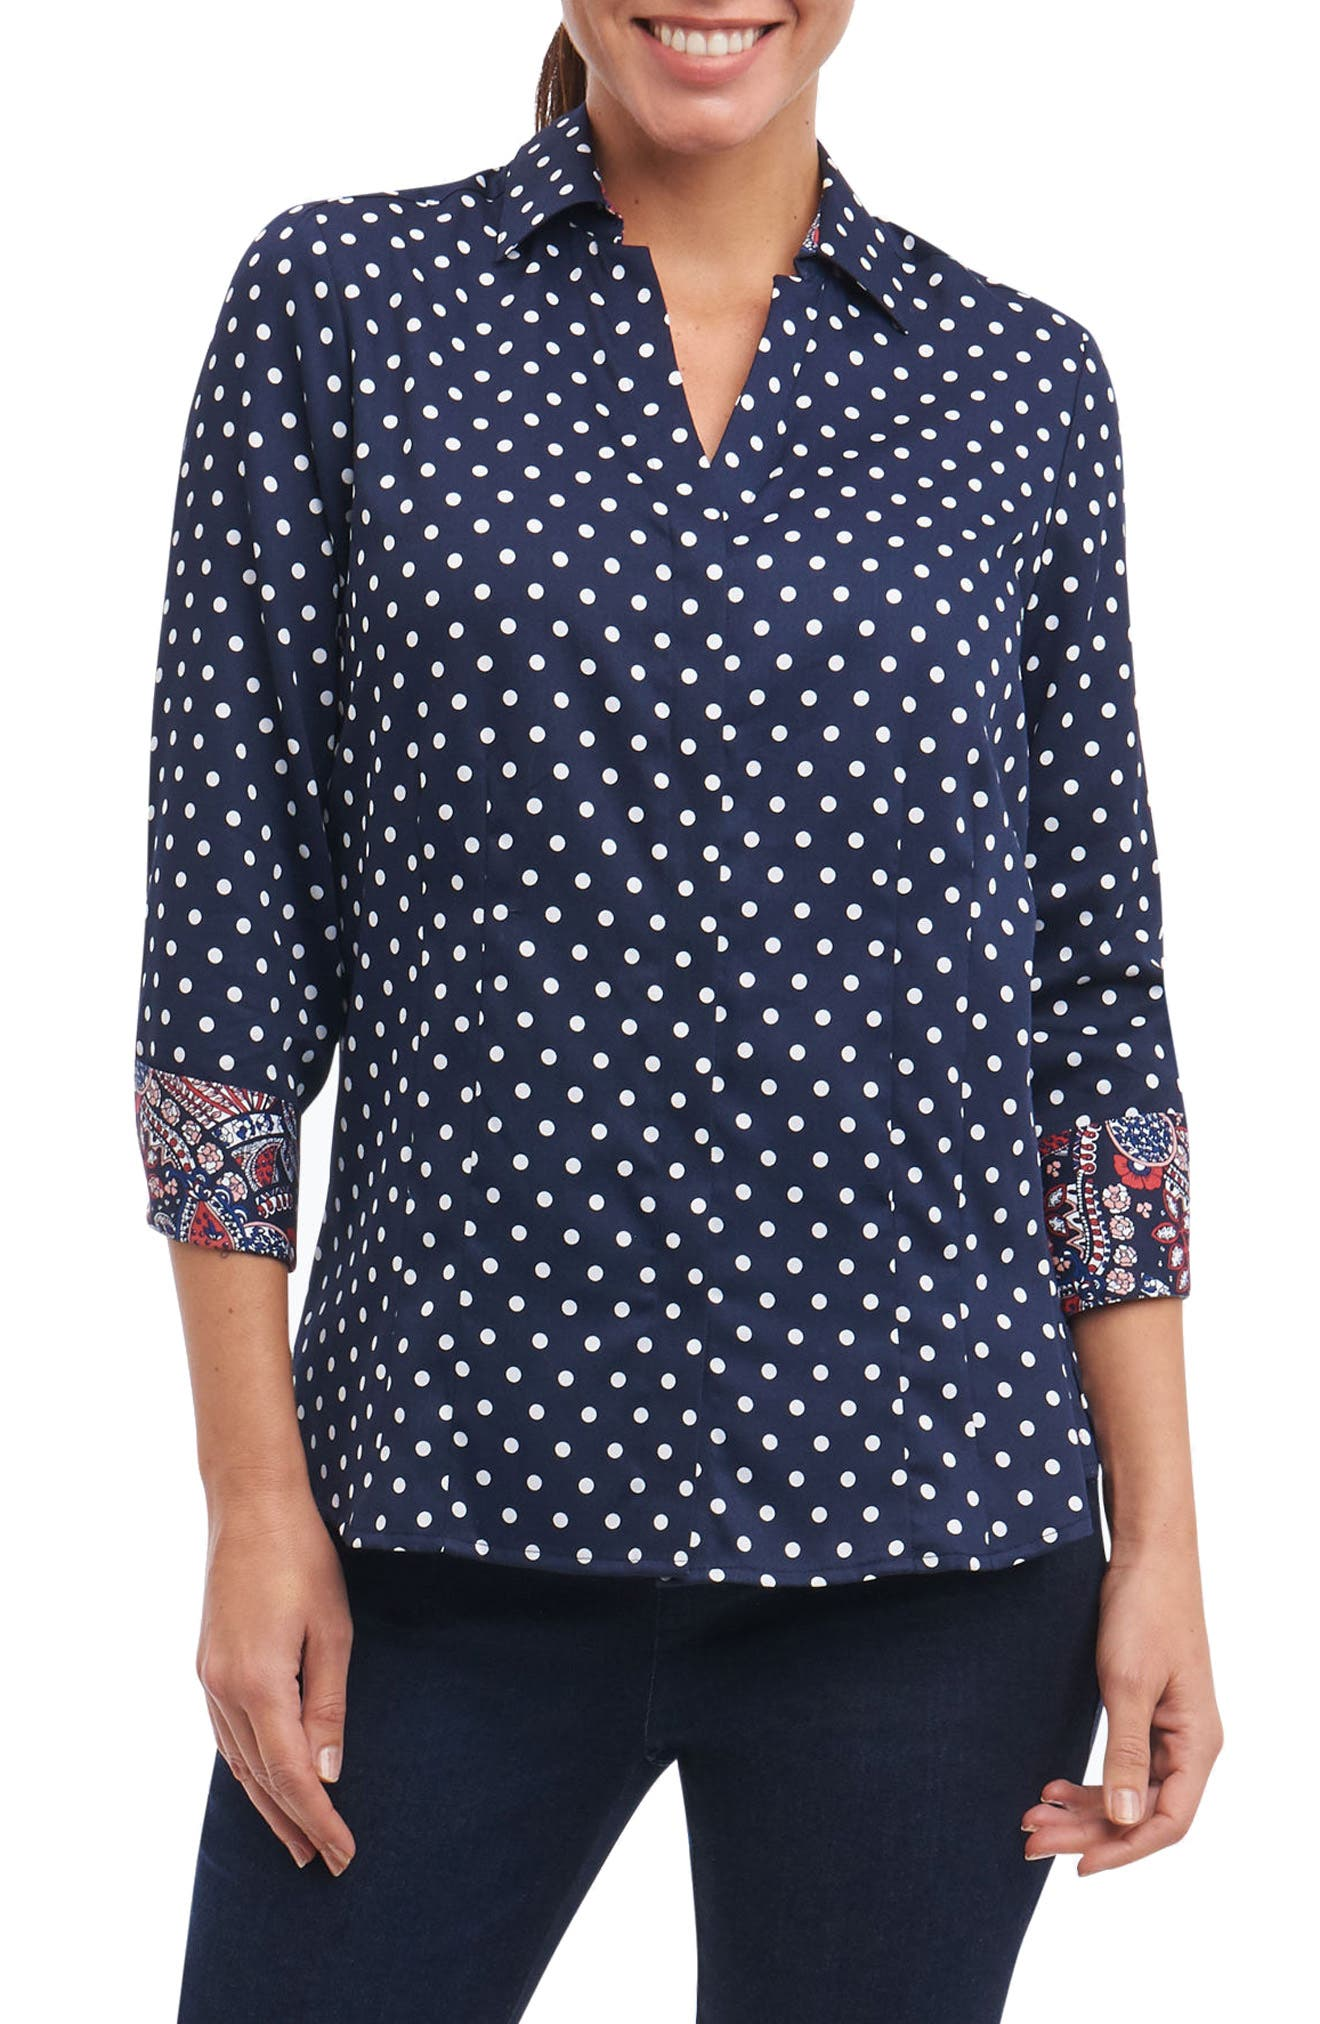 Taylor Classic Dot Non-Iron Cotton Shirt,                             Main thumbnail 1, color,